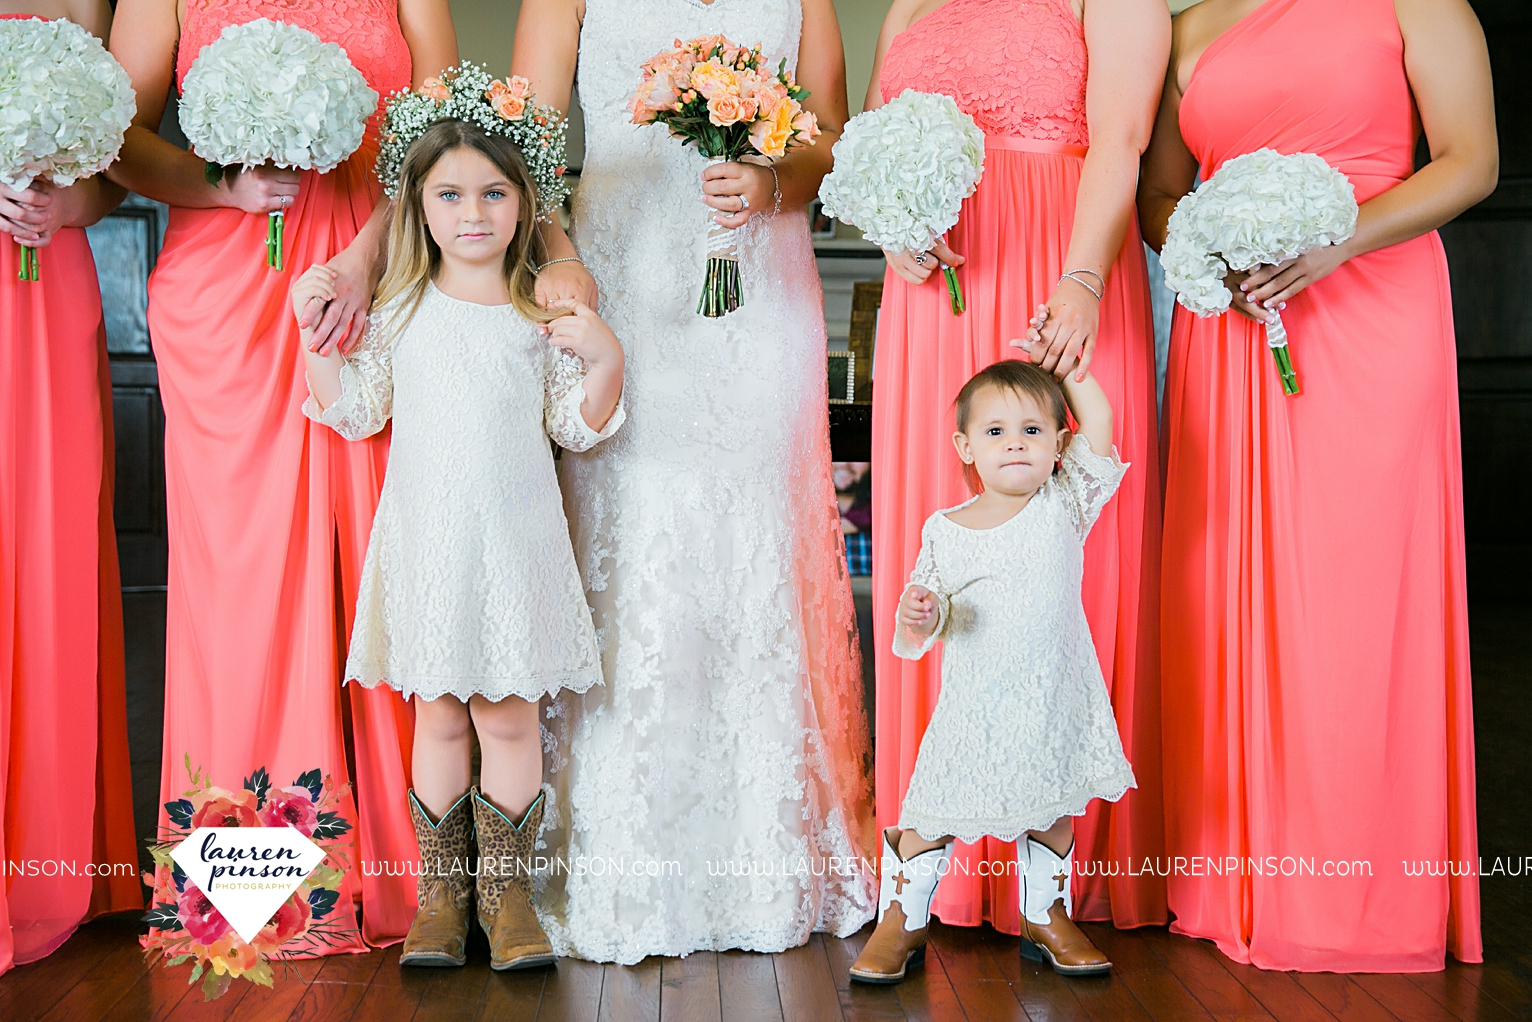 wichita-falls-texas-wedding-photographer-wellington-on-the-lake-with-mayfield-events_2962.jpg